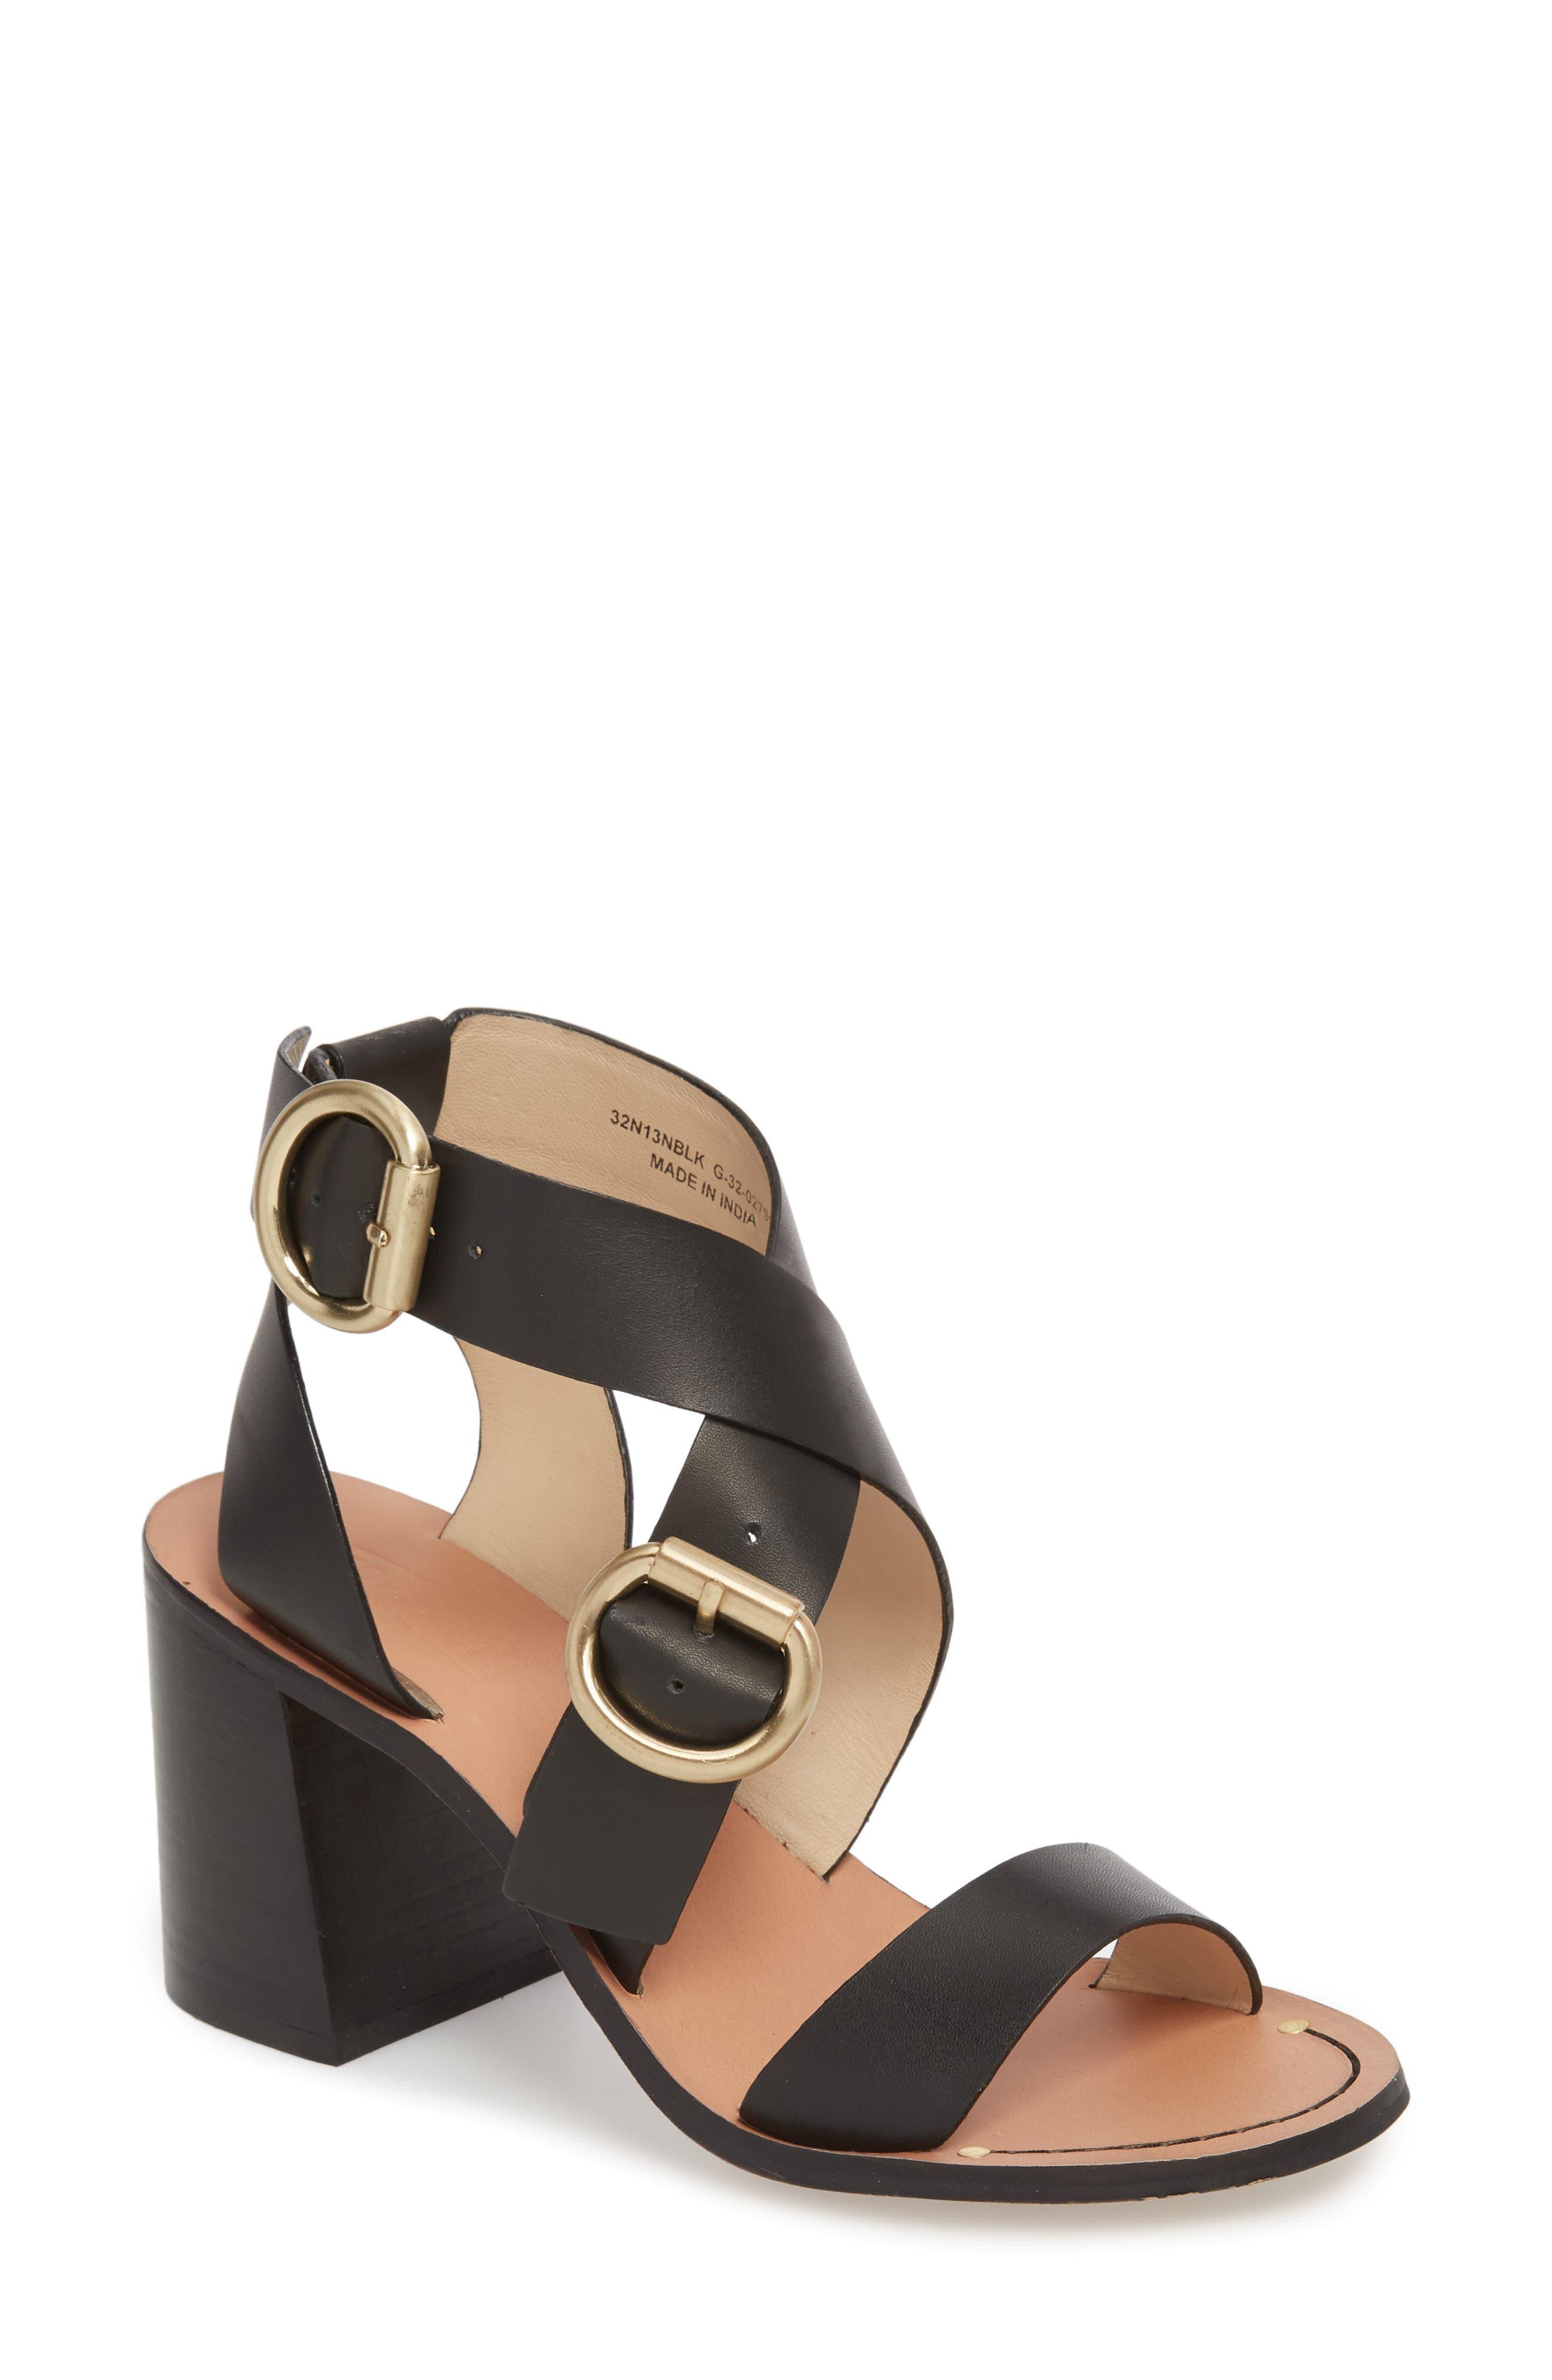 Natalie Buckled Cross Strap Sandal,                             Main thumbnail 1, color,                             Black Multi